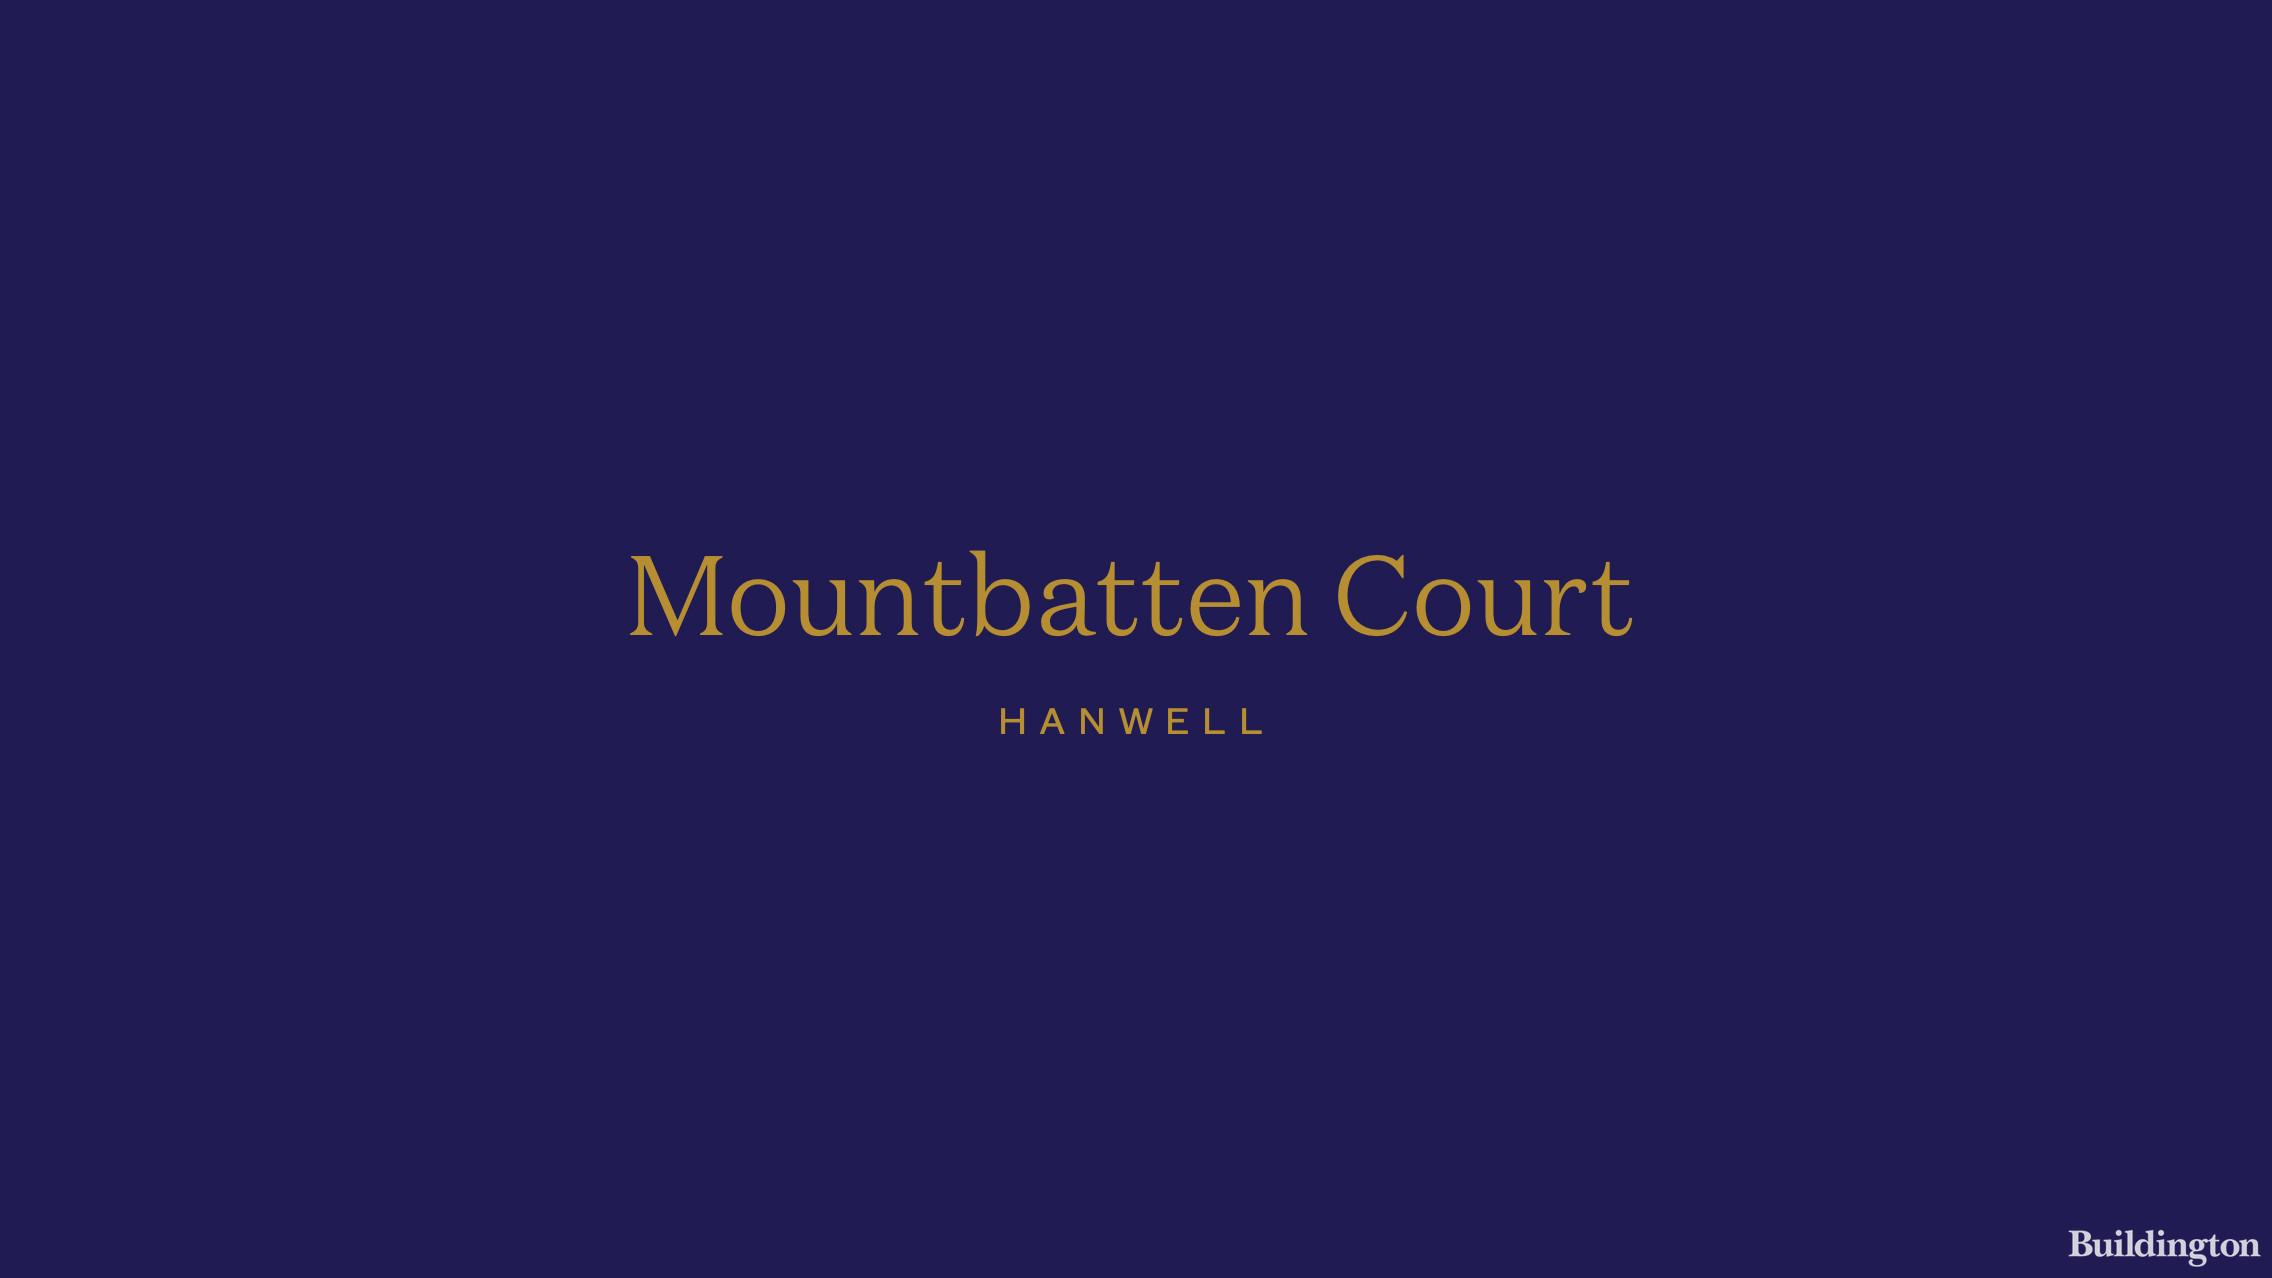 Mountbatten Court development logo.